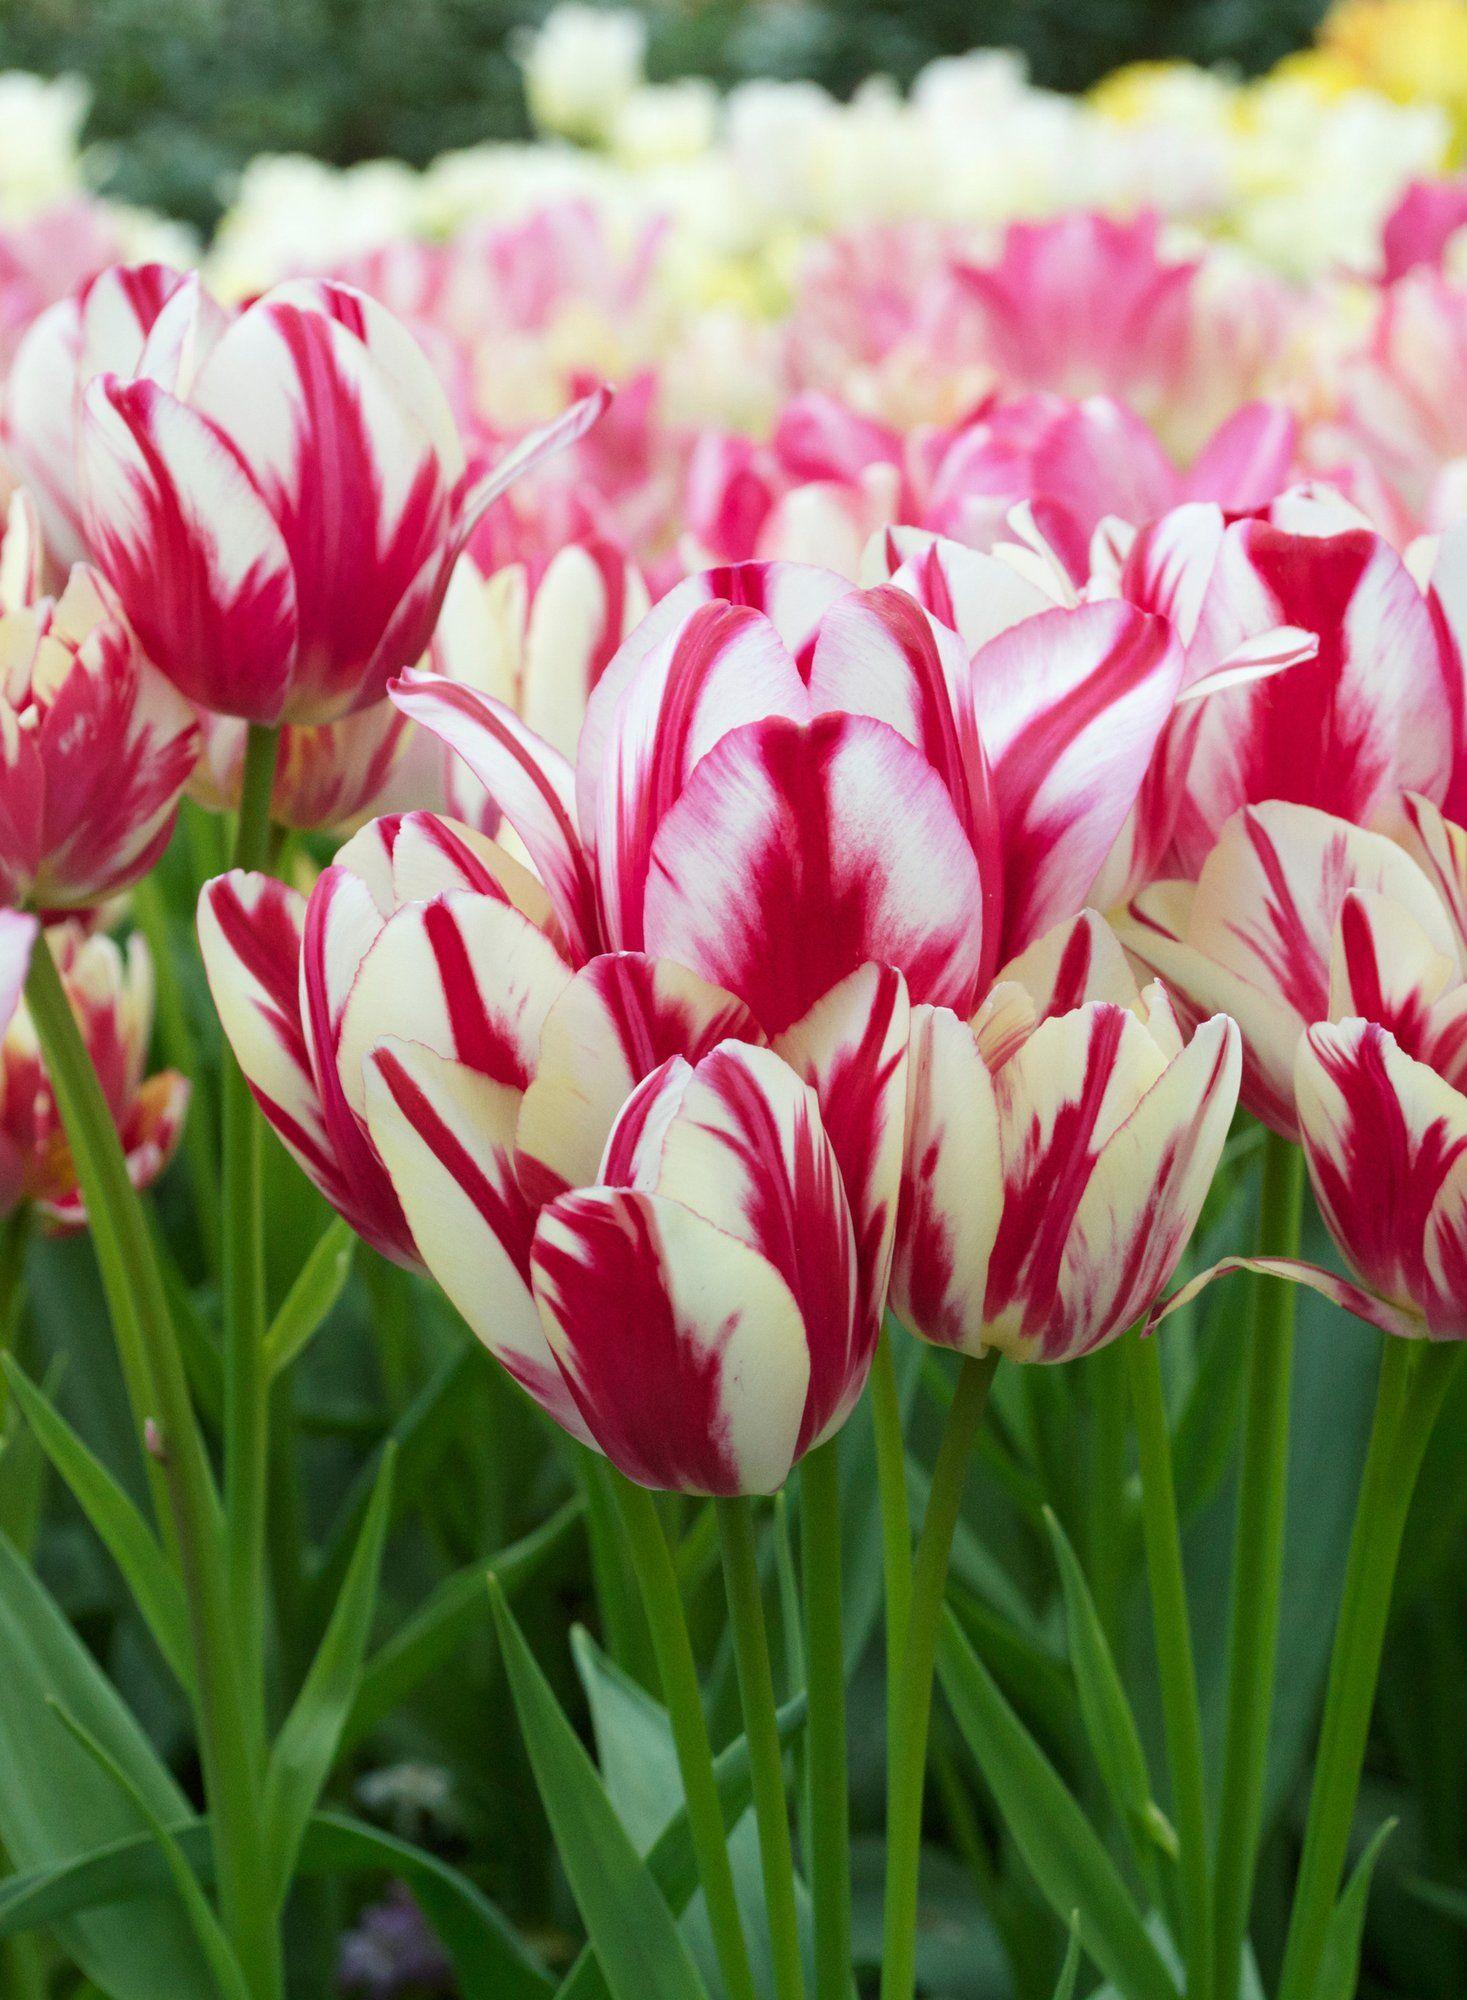 Multi Flowering Tulip Bulbs Spring Garden Flowers Tulips Spring Flowers